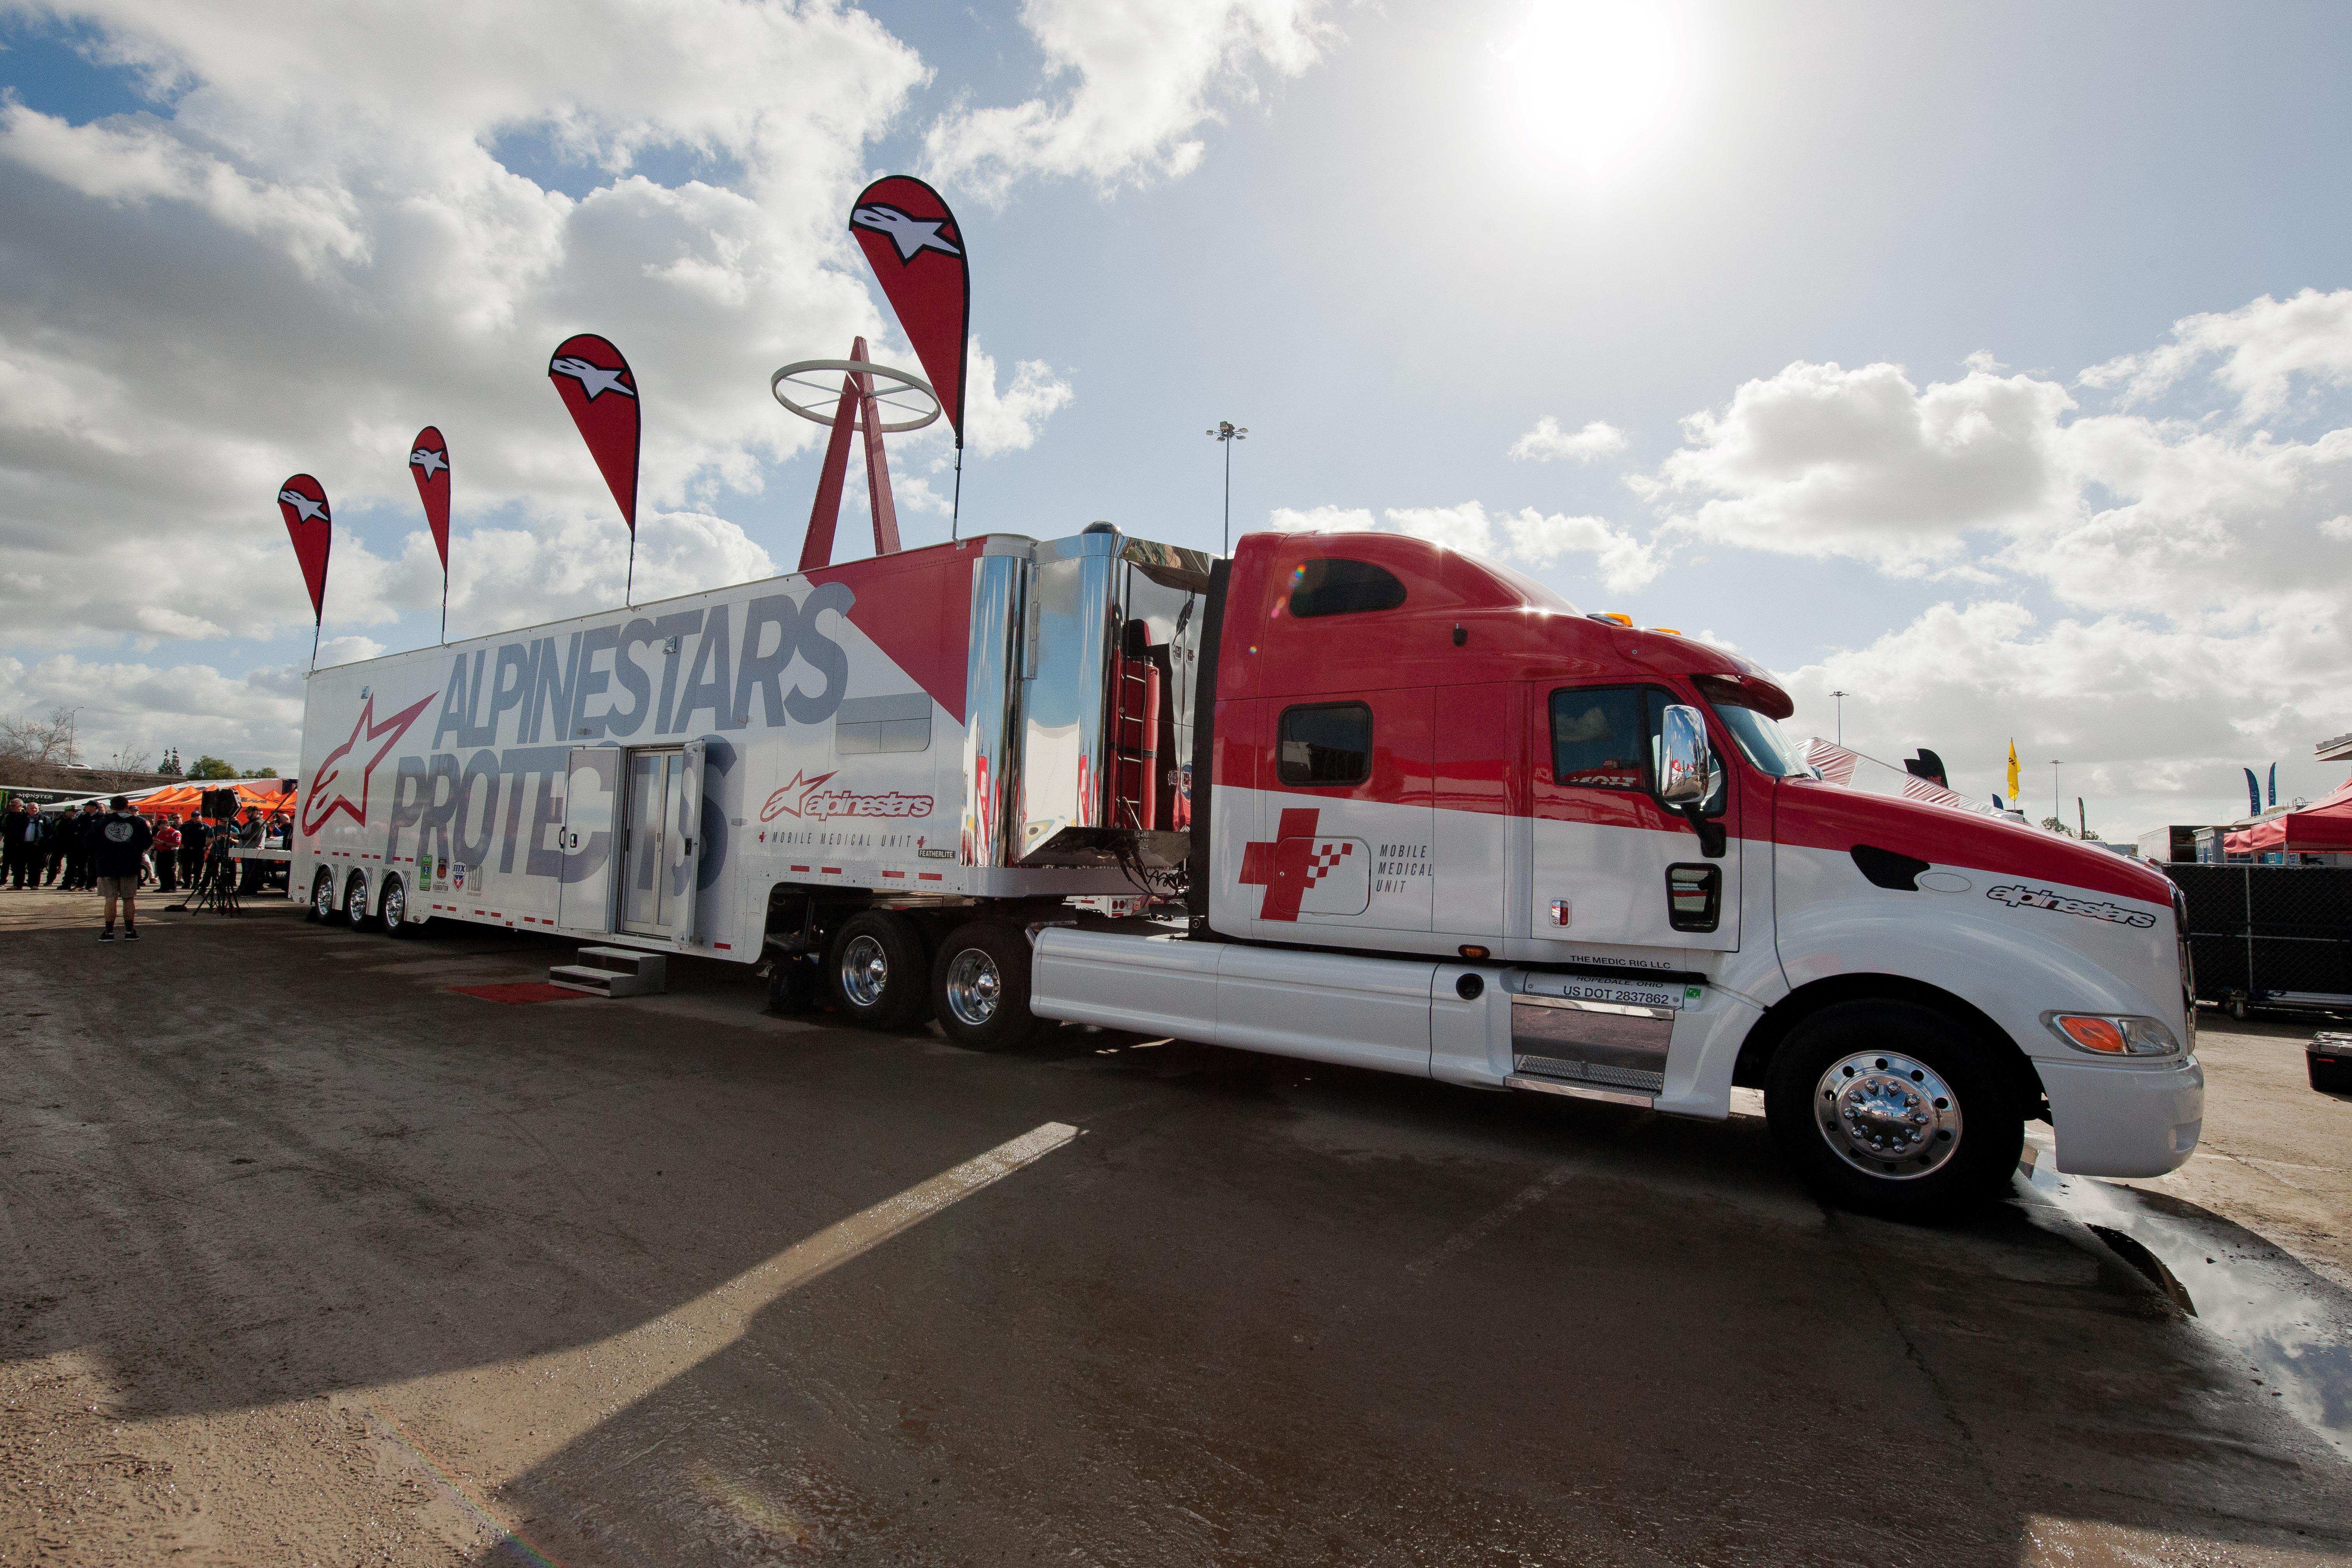 2017 – Alpinestars Mobile Medical Unit